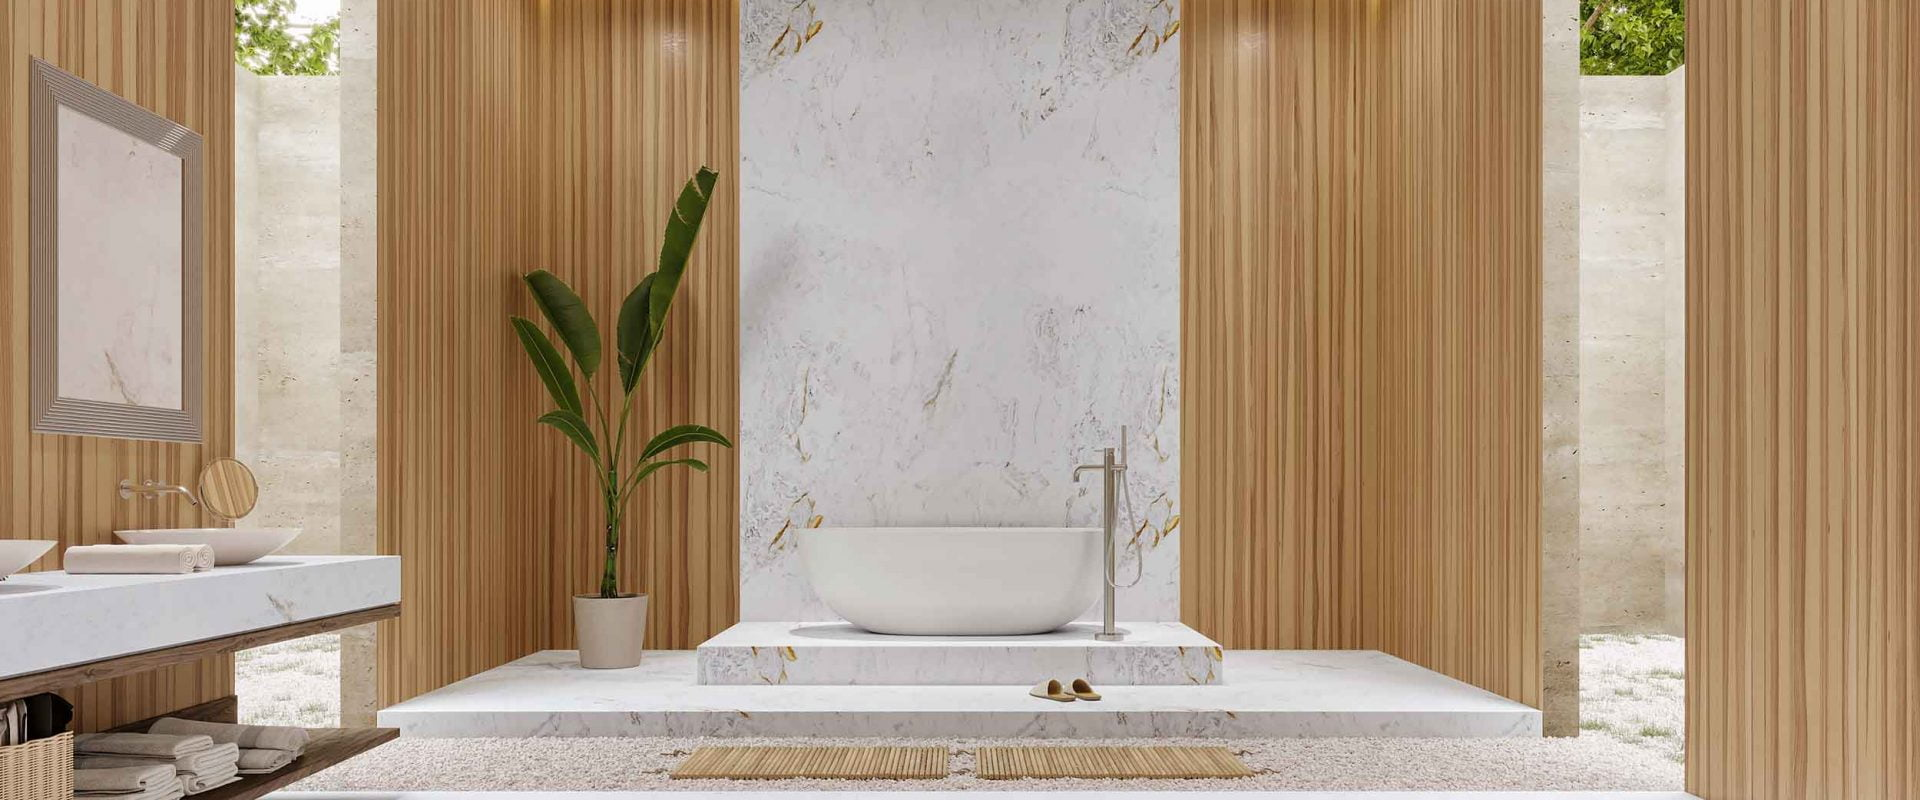 banheiro-calacatta-columbus-03